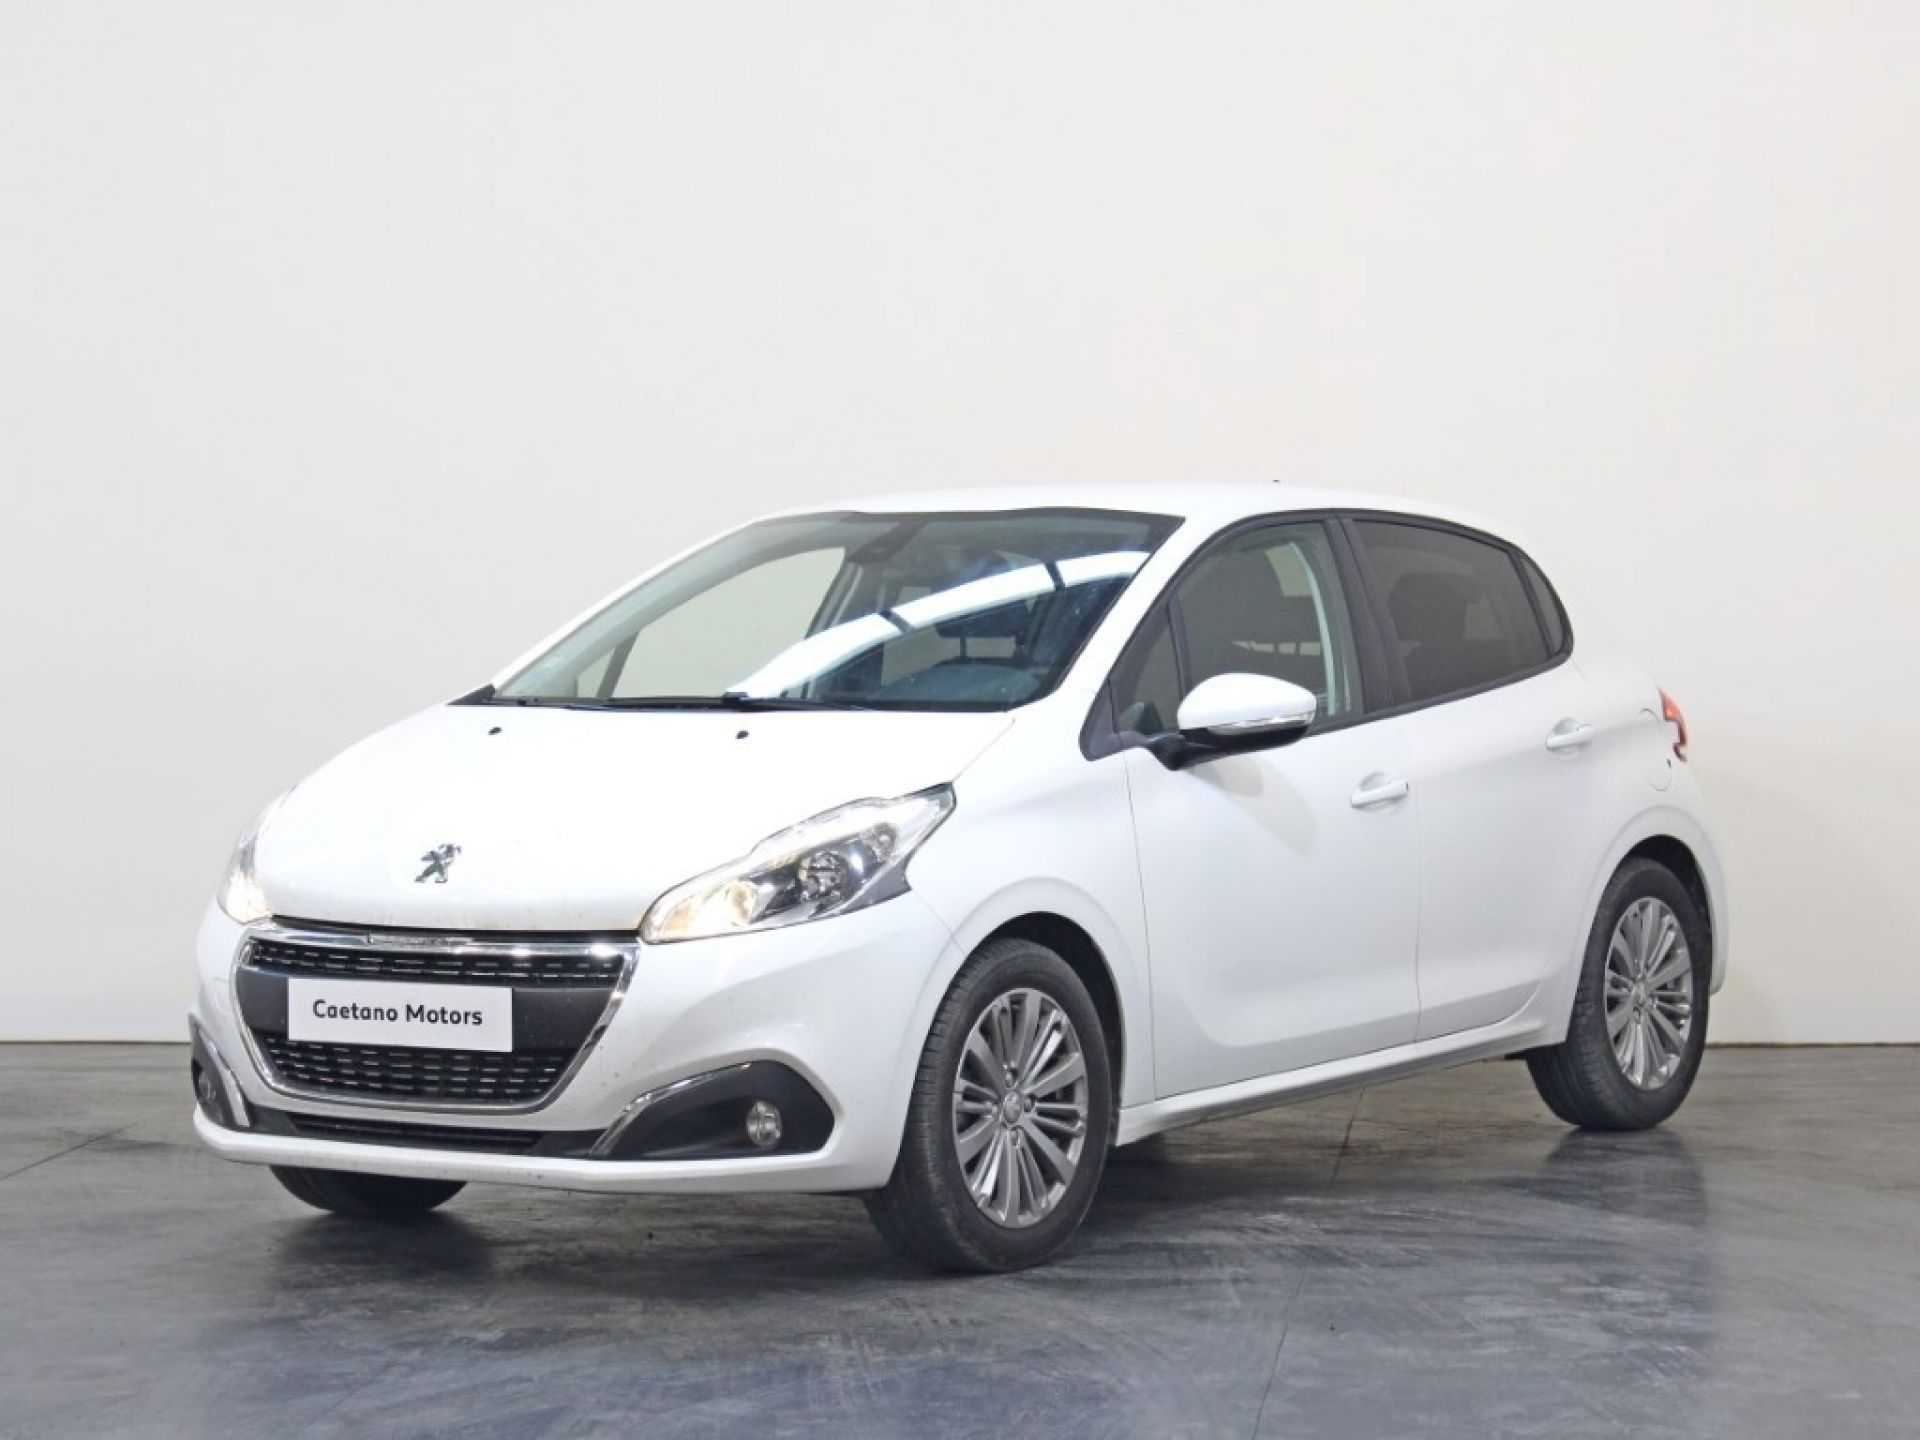 Peugeot 208 Signature 1.2 PureTech 82 Euro 6.2 usada Porto